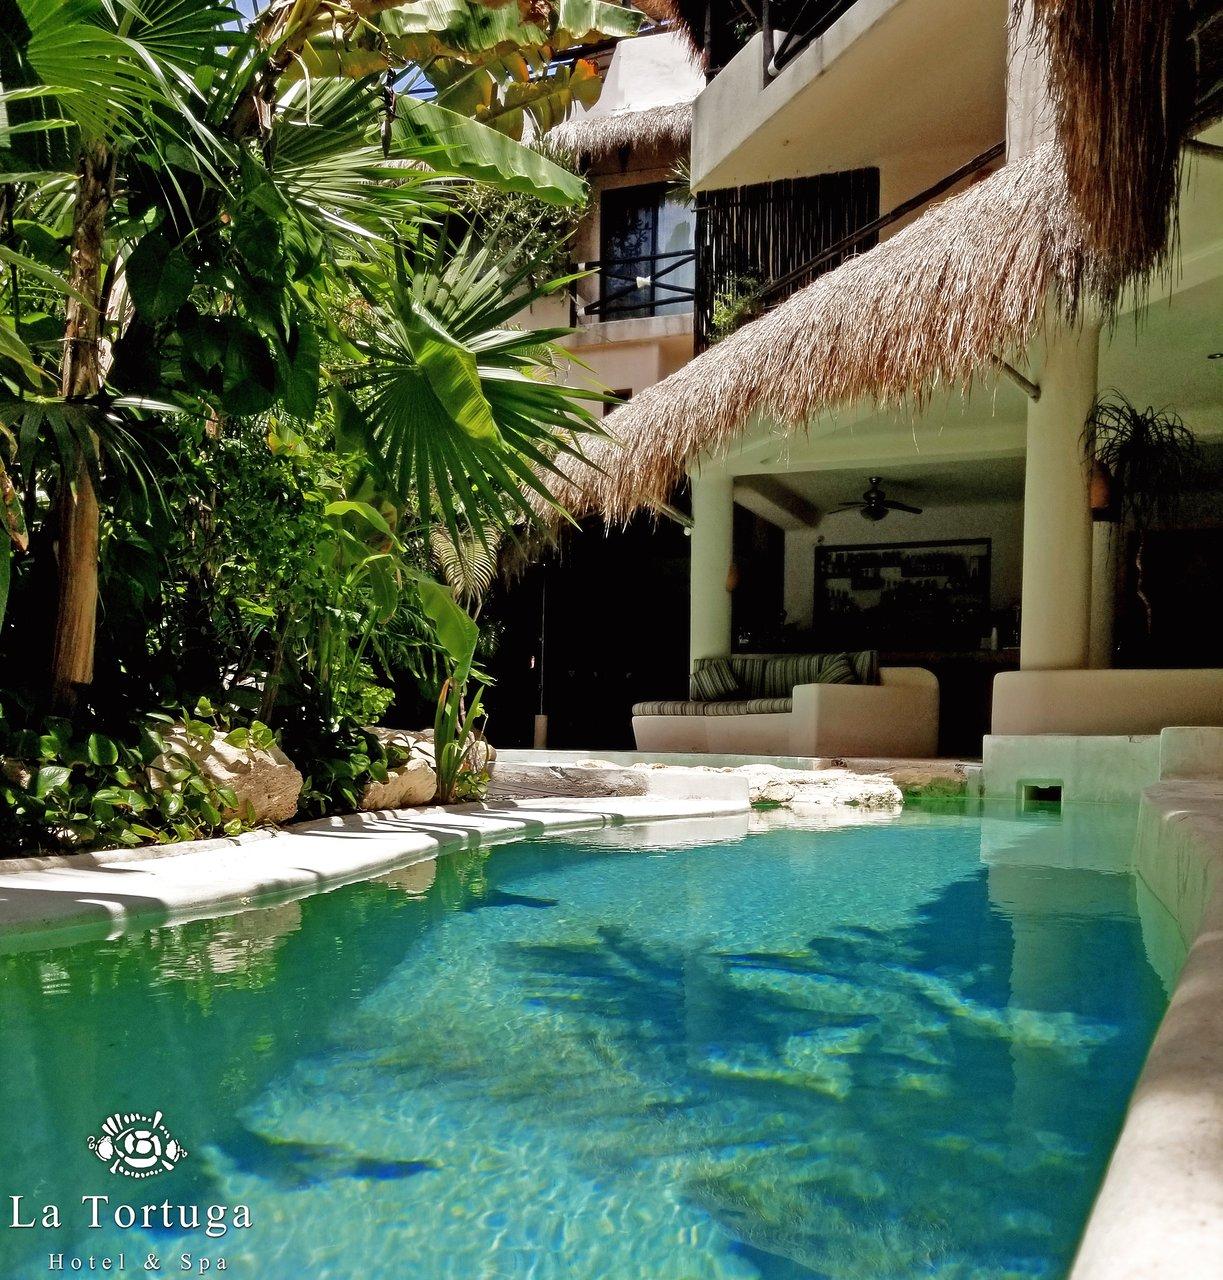 La Tortuga Hotel Spa 139 2 5 4 Updated 2018 Prices Reviews Riviera Maya Playa Del Carmen Mexico Tripadvisor